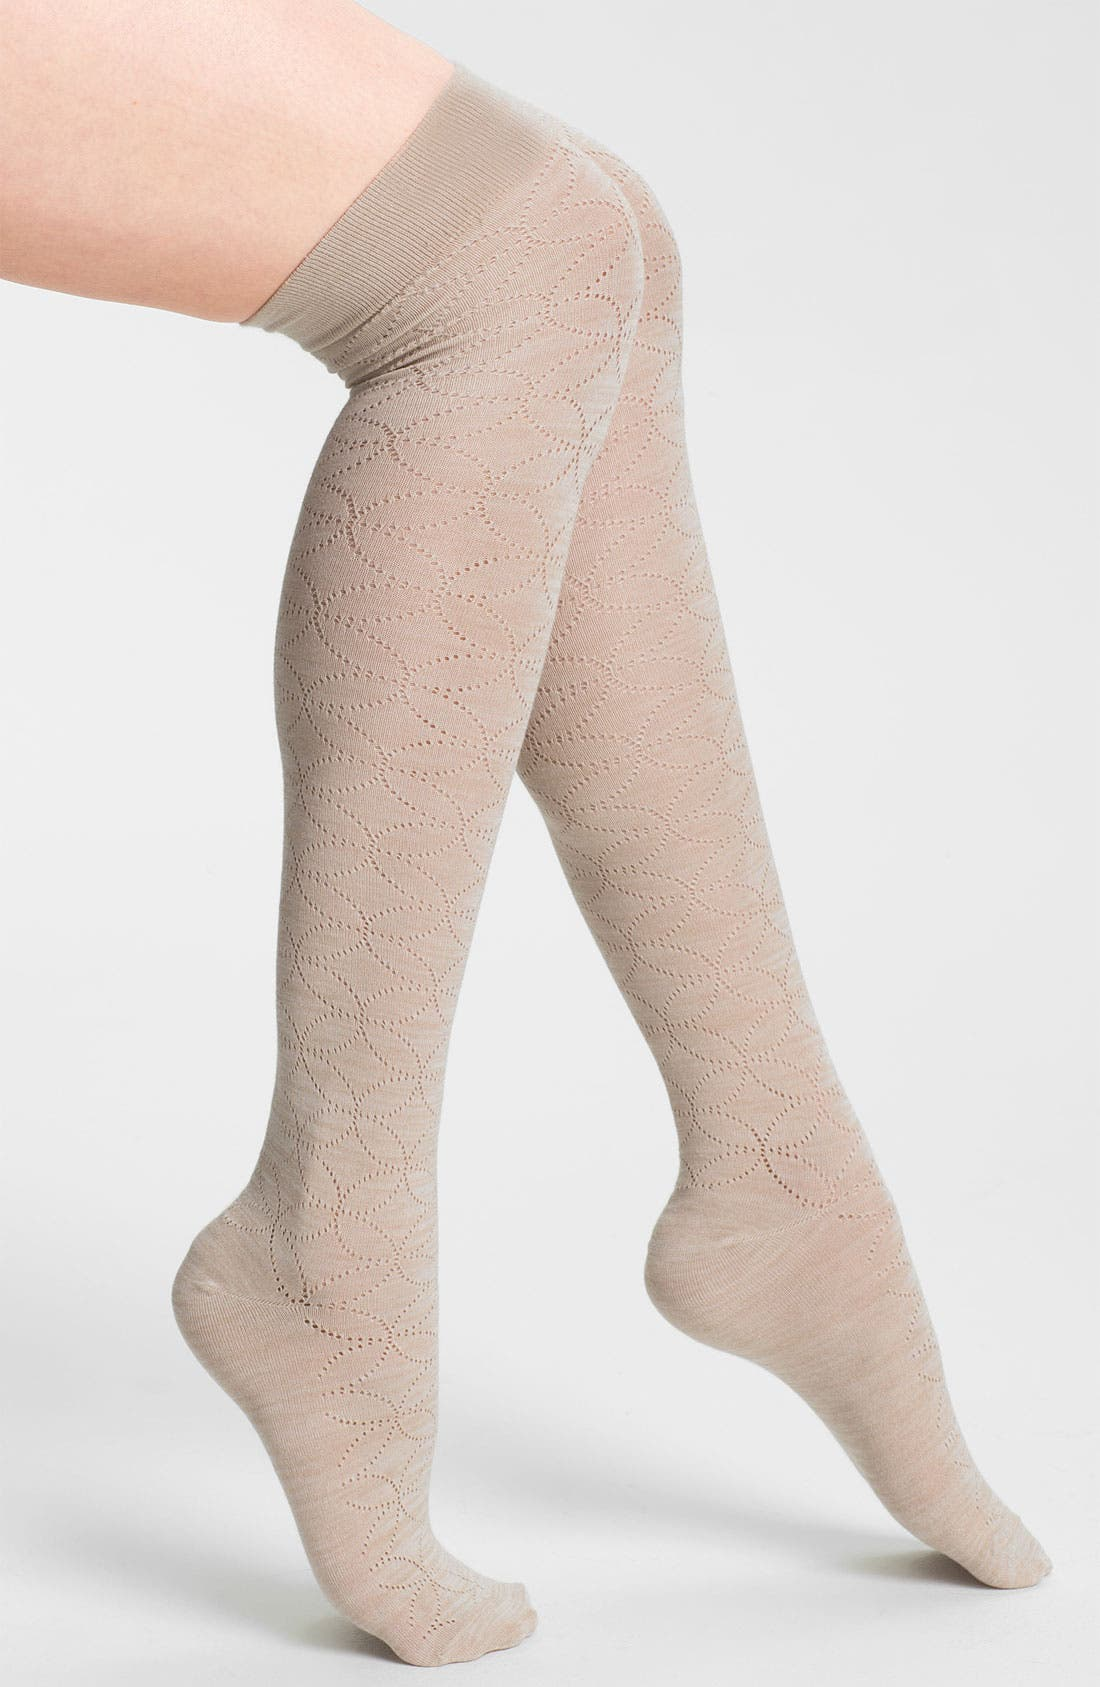 Alternate Image 1 Selected - Nordstrom 'Inside the Lines' Over the Knee Socks